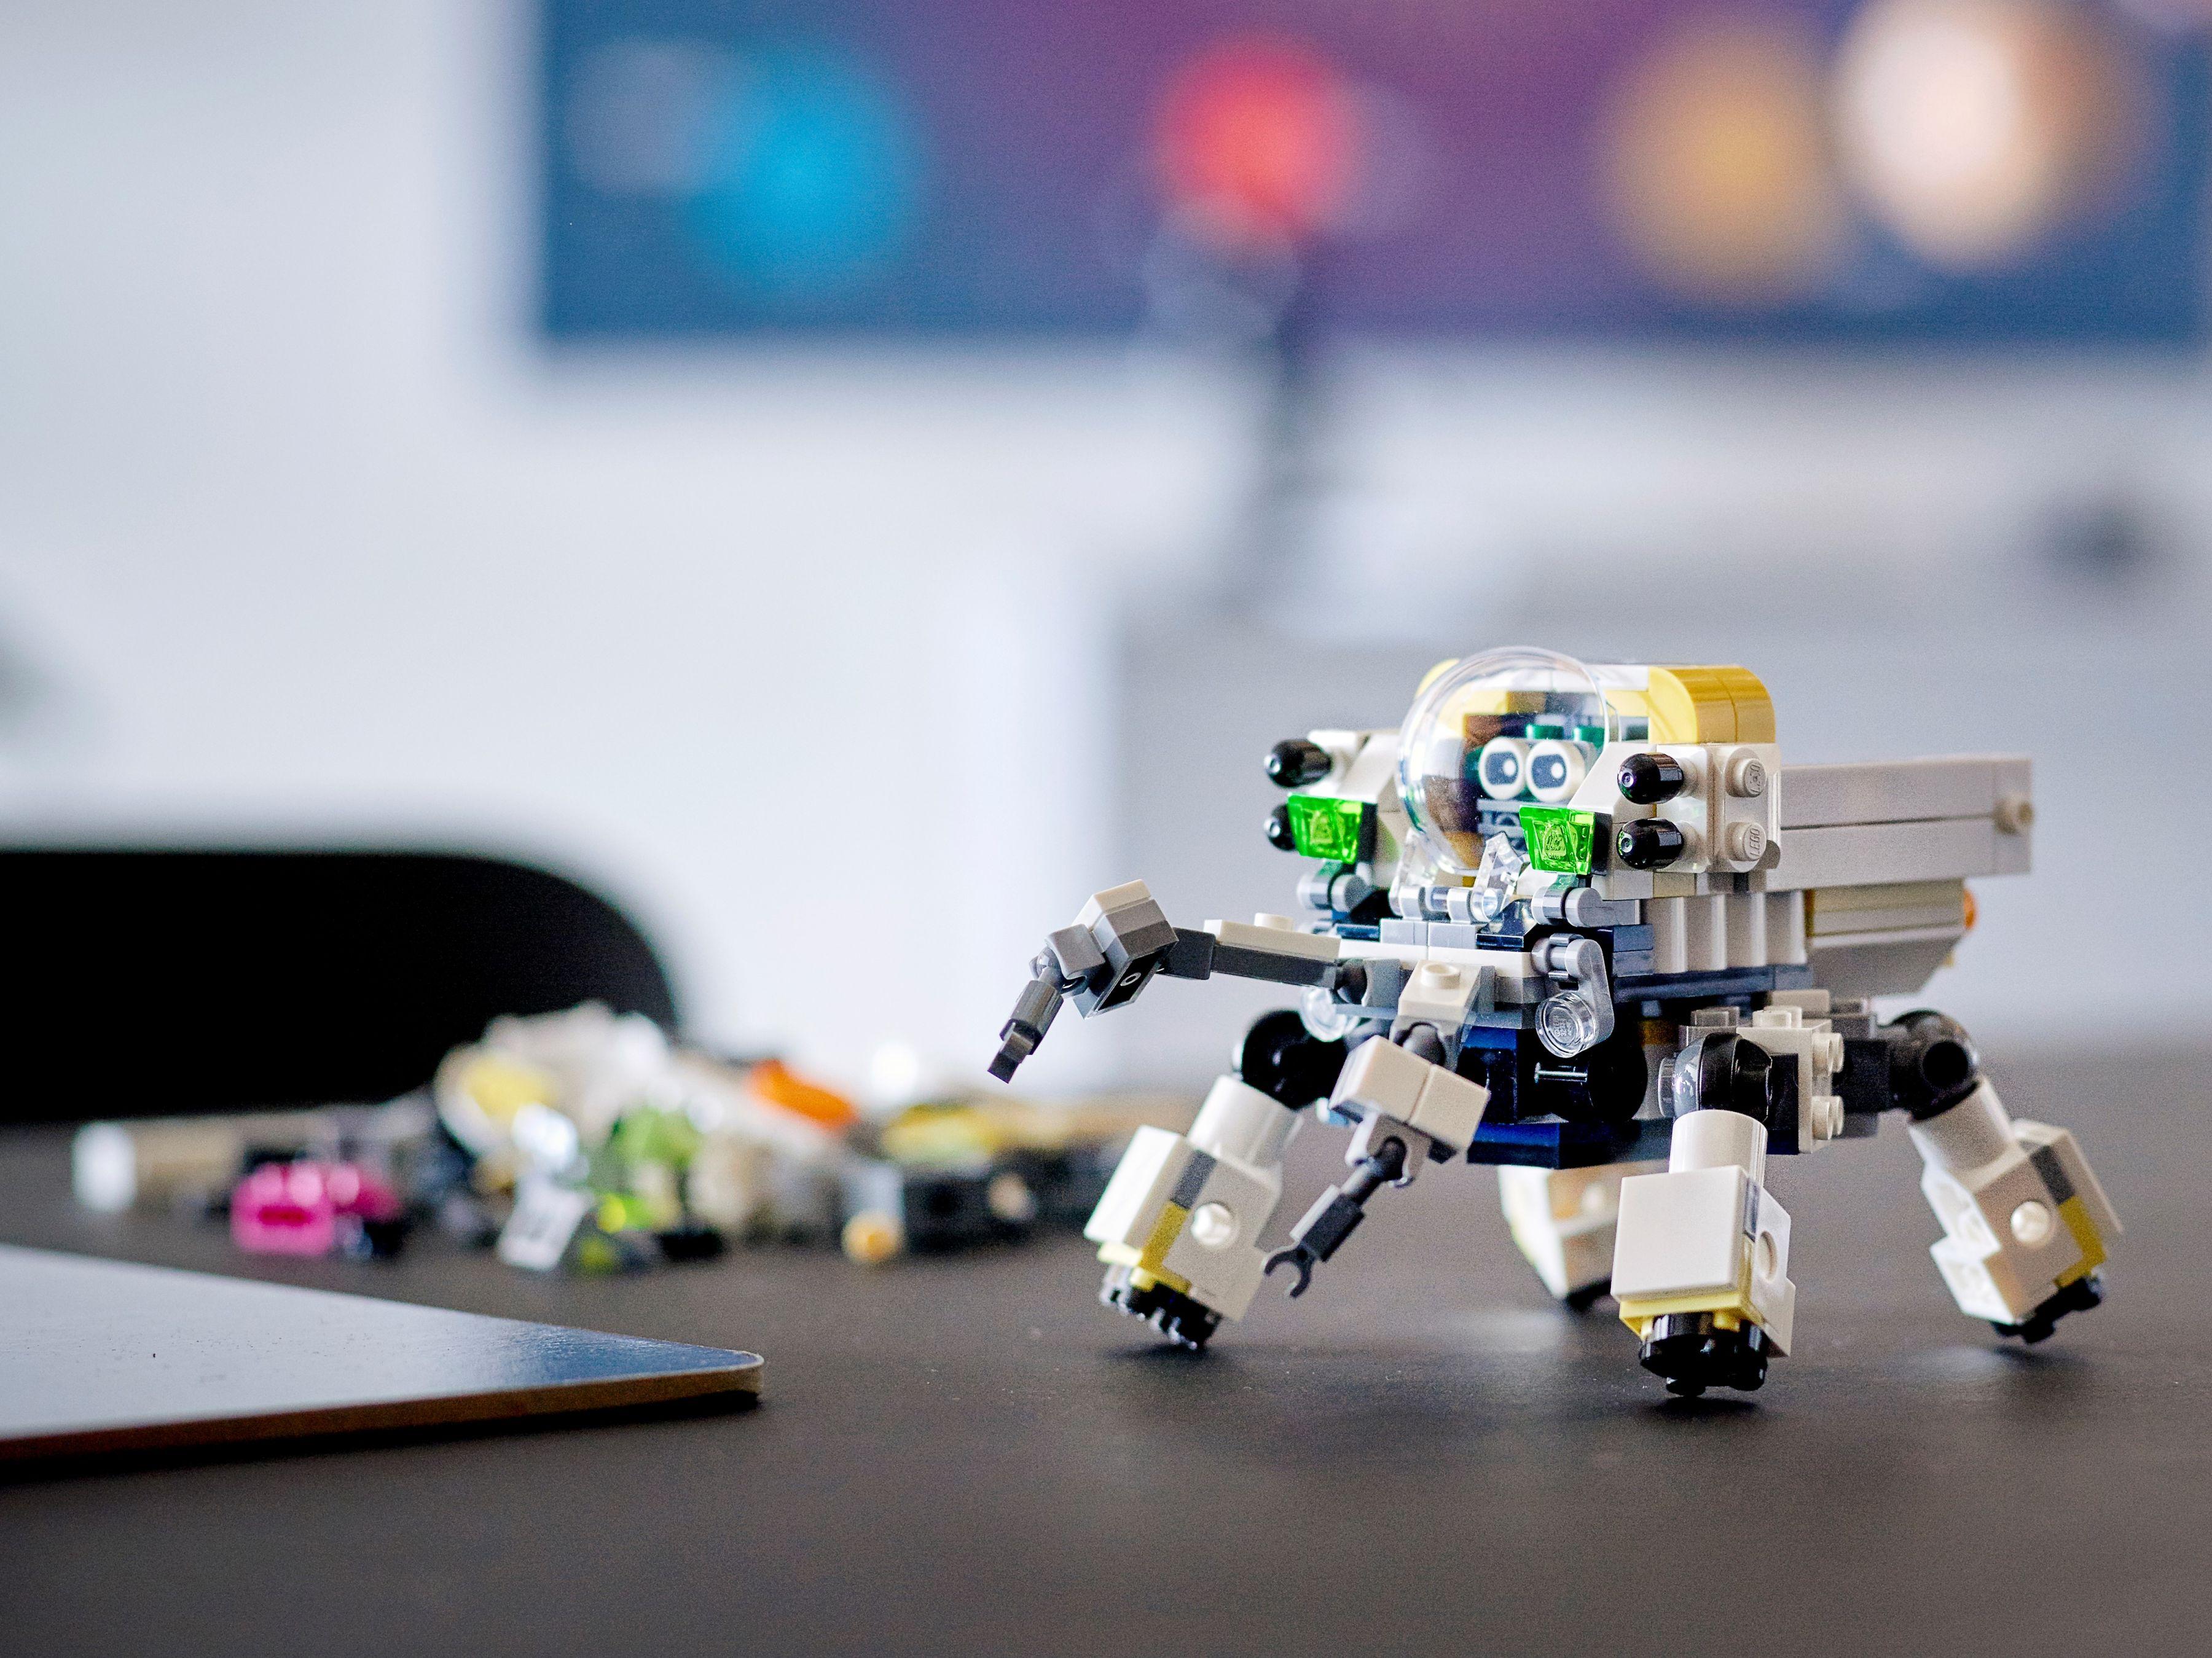 Lego Creator Weltraum Mech 31115 2021 Ab 18 39 26 Gespart Stand 11 03 2021 Lego Preisvergleich Brickmerge De